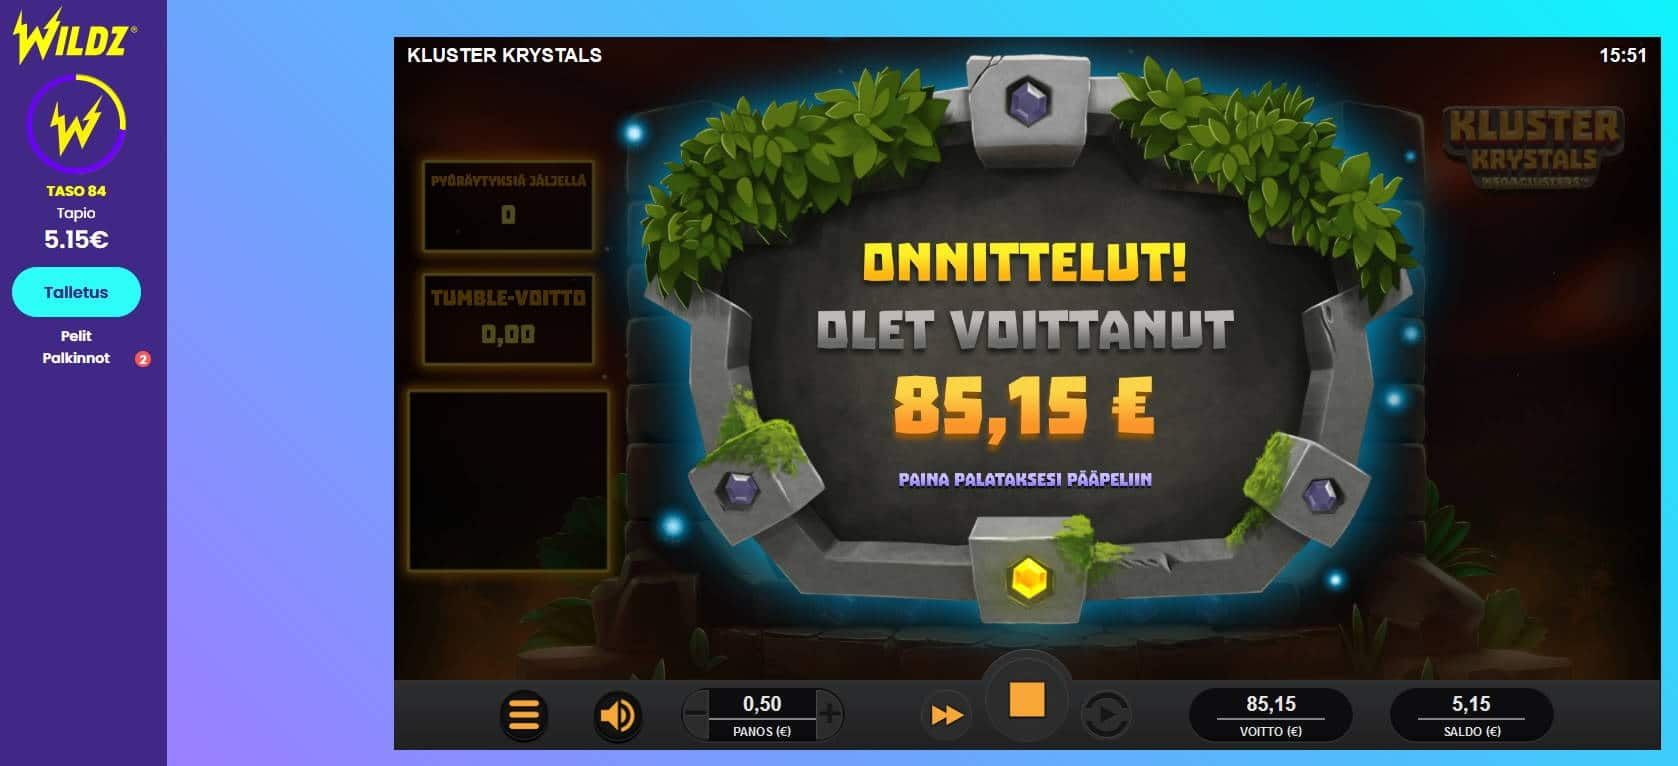 Kluster Krystals Casino win picture by Mrmork666 28.4.2021 85.15e 170X Wildz